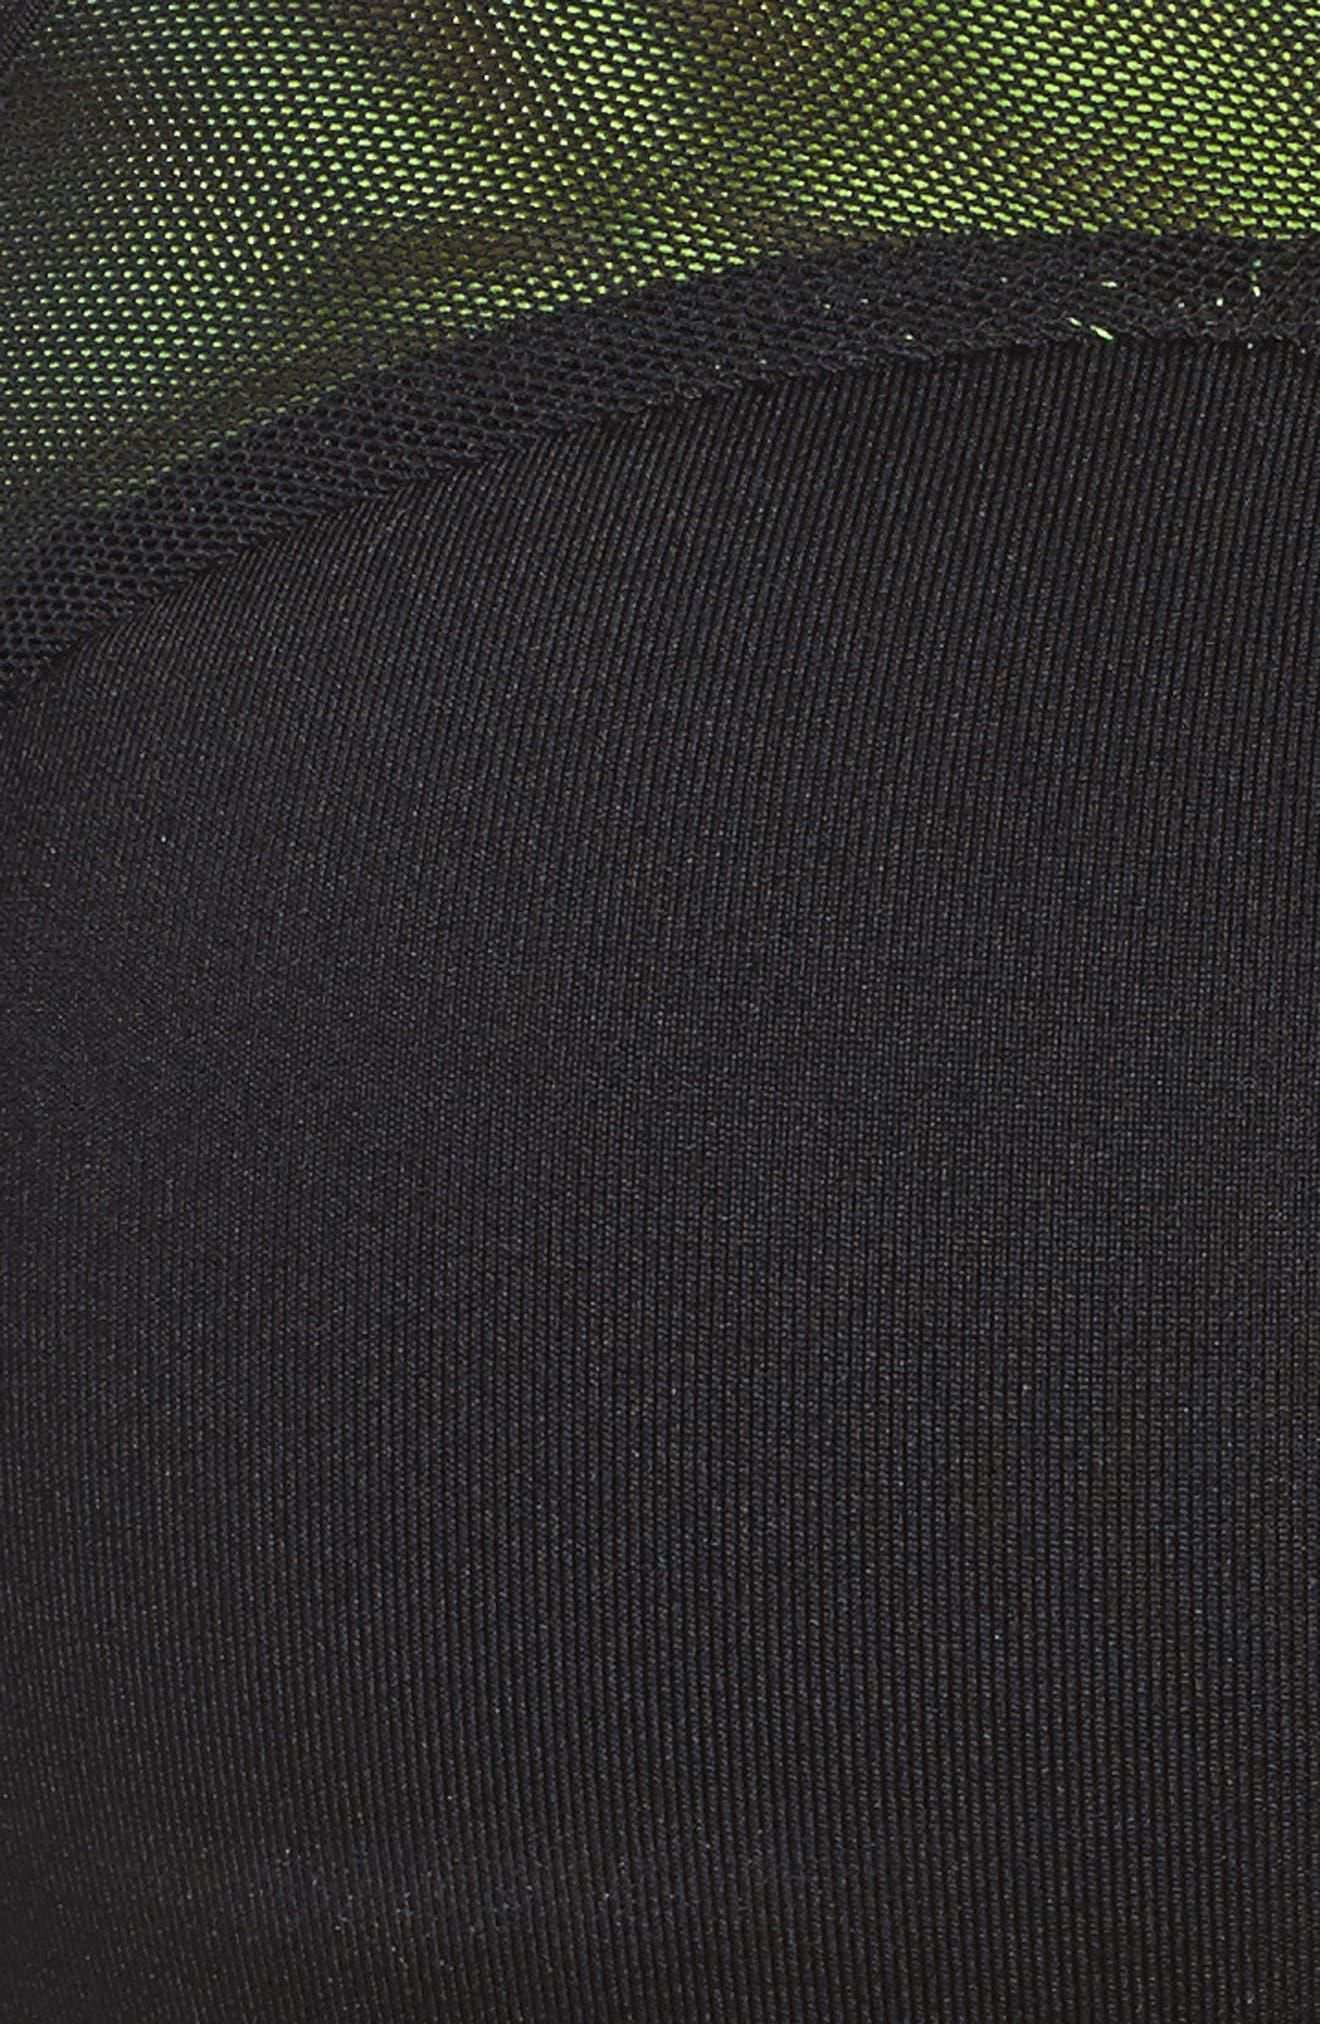 Pro Classic Swoosh Modern Sports Bra,                             Alternate thumbnail 4, color,                             Black/ Black/ Volt/ White